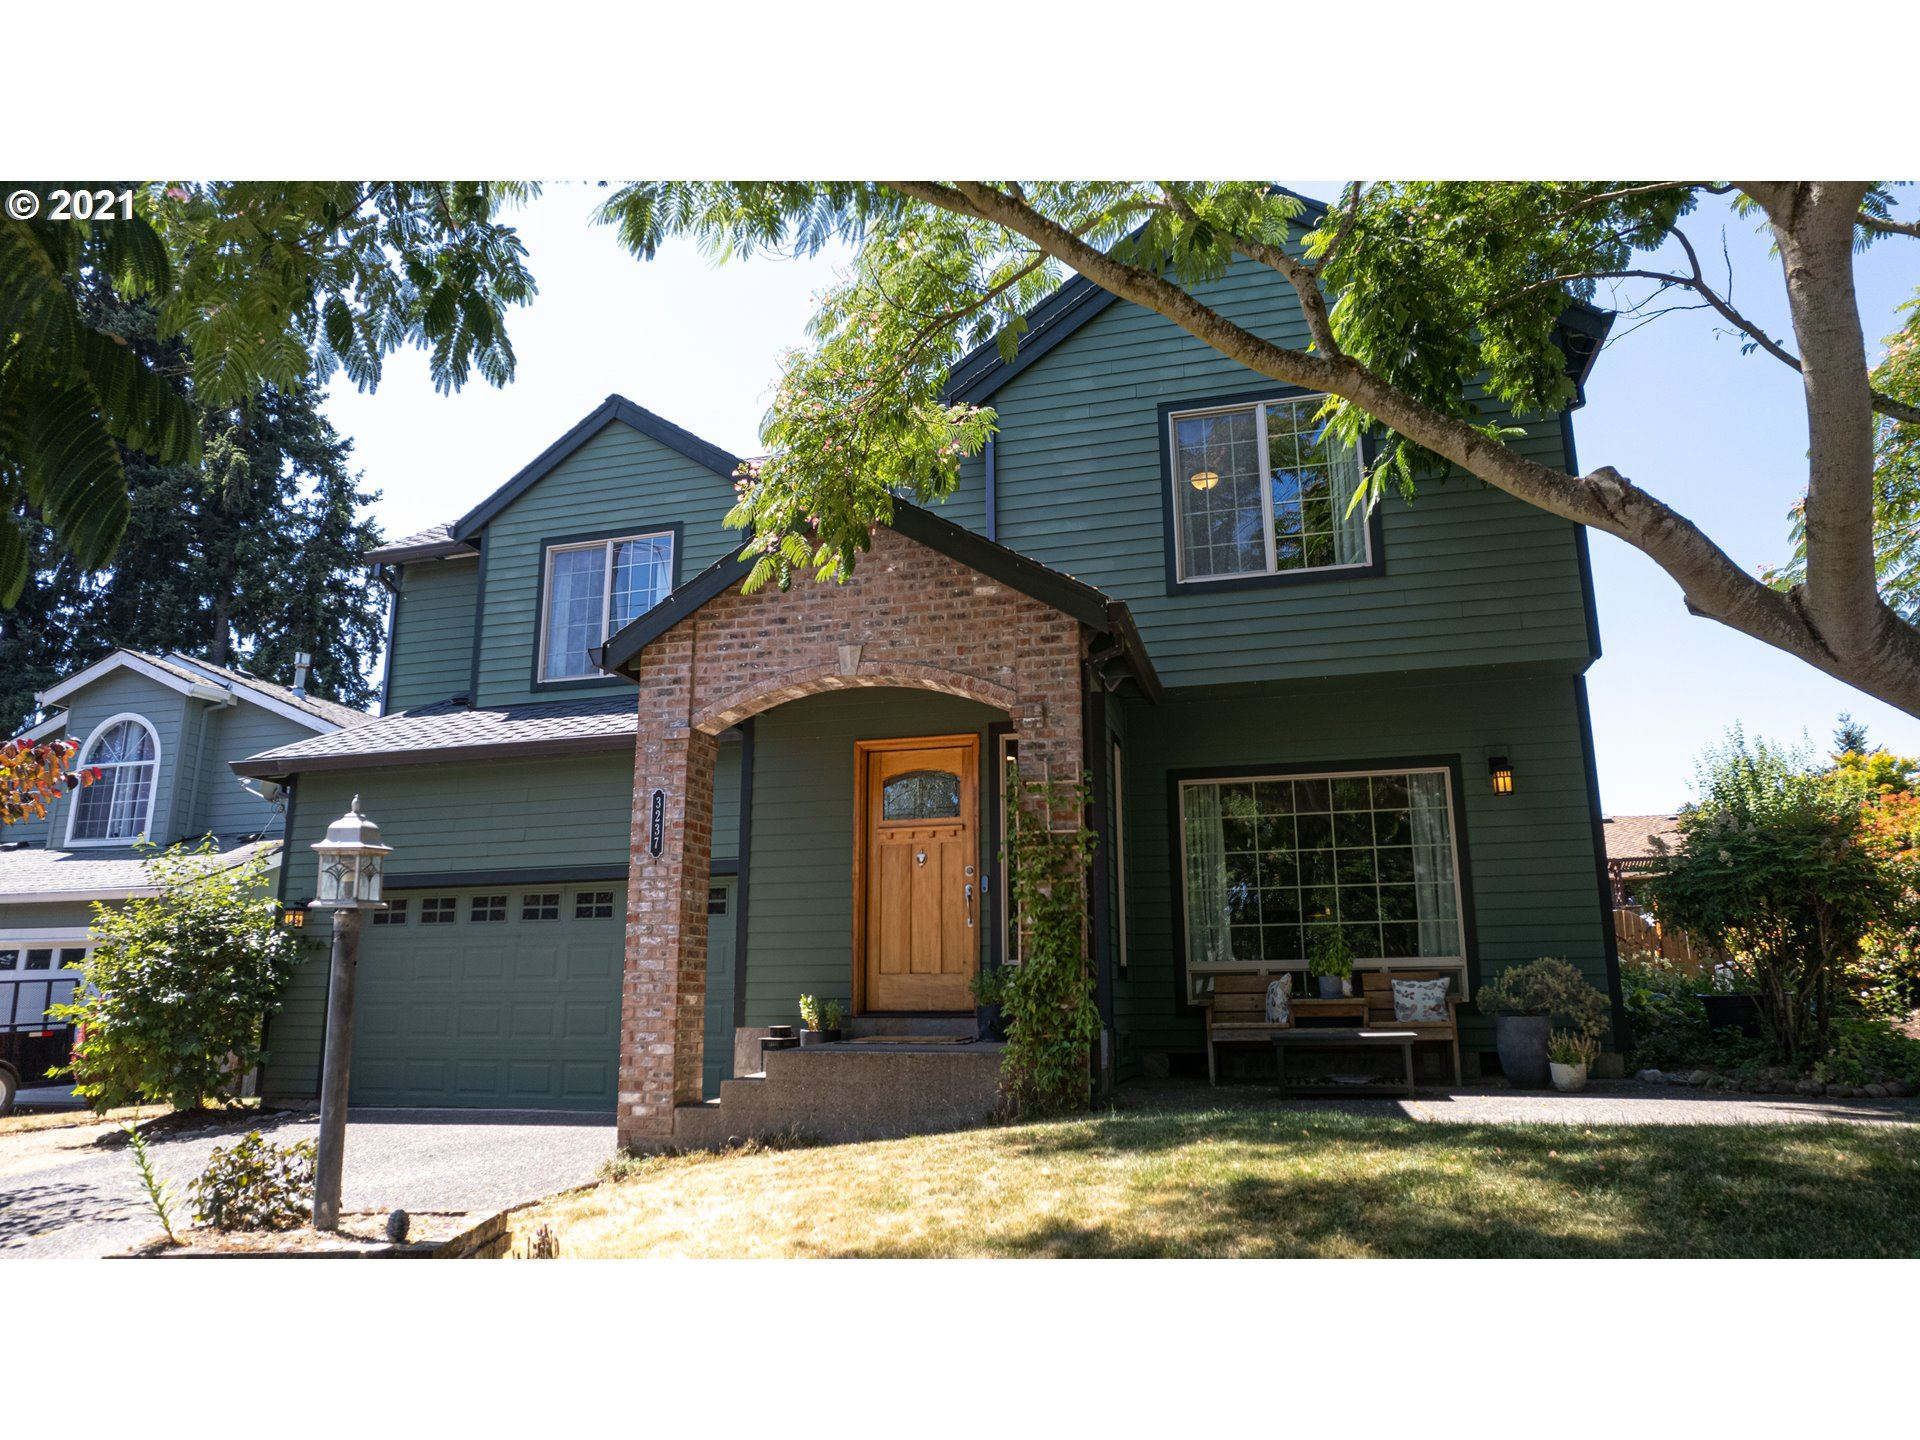 3237 NW 165TH PL, Beaverton, OR 97006 - MLS#: 21473653